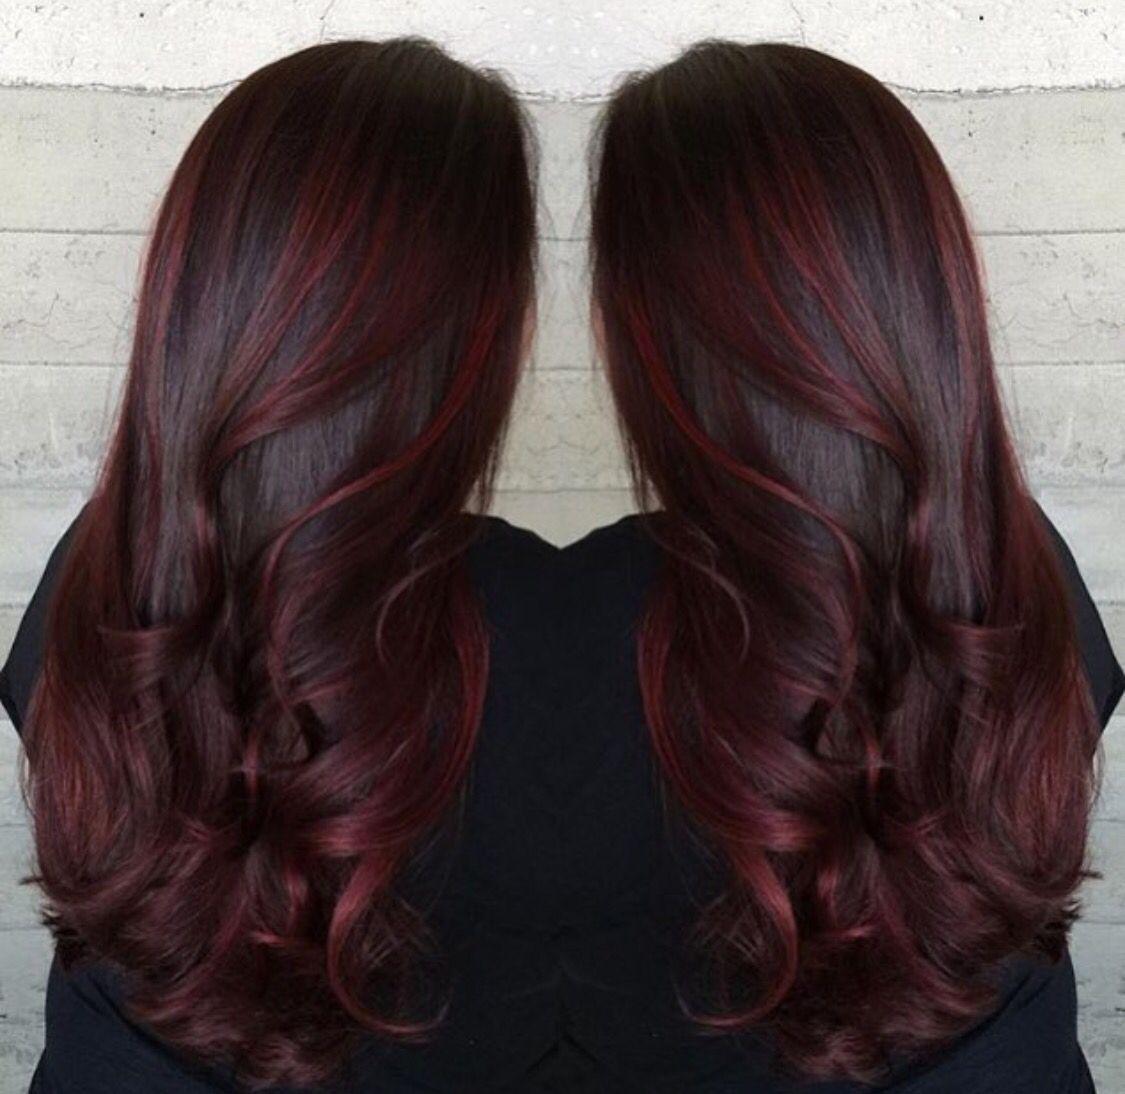 Pin by melissa fergus on hair ideas pinterest pretty hair color